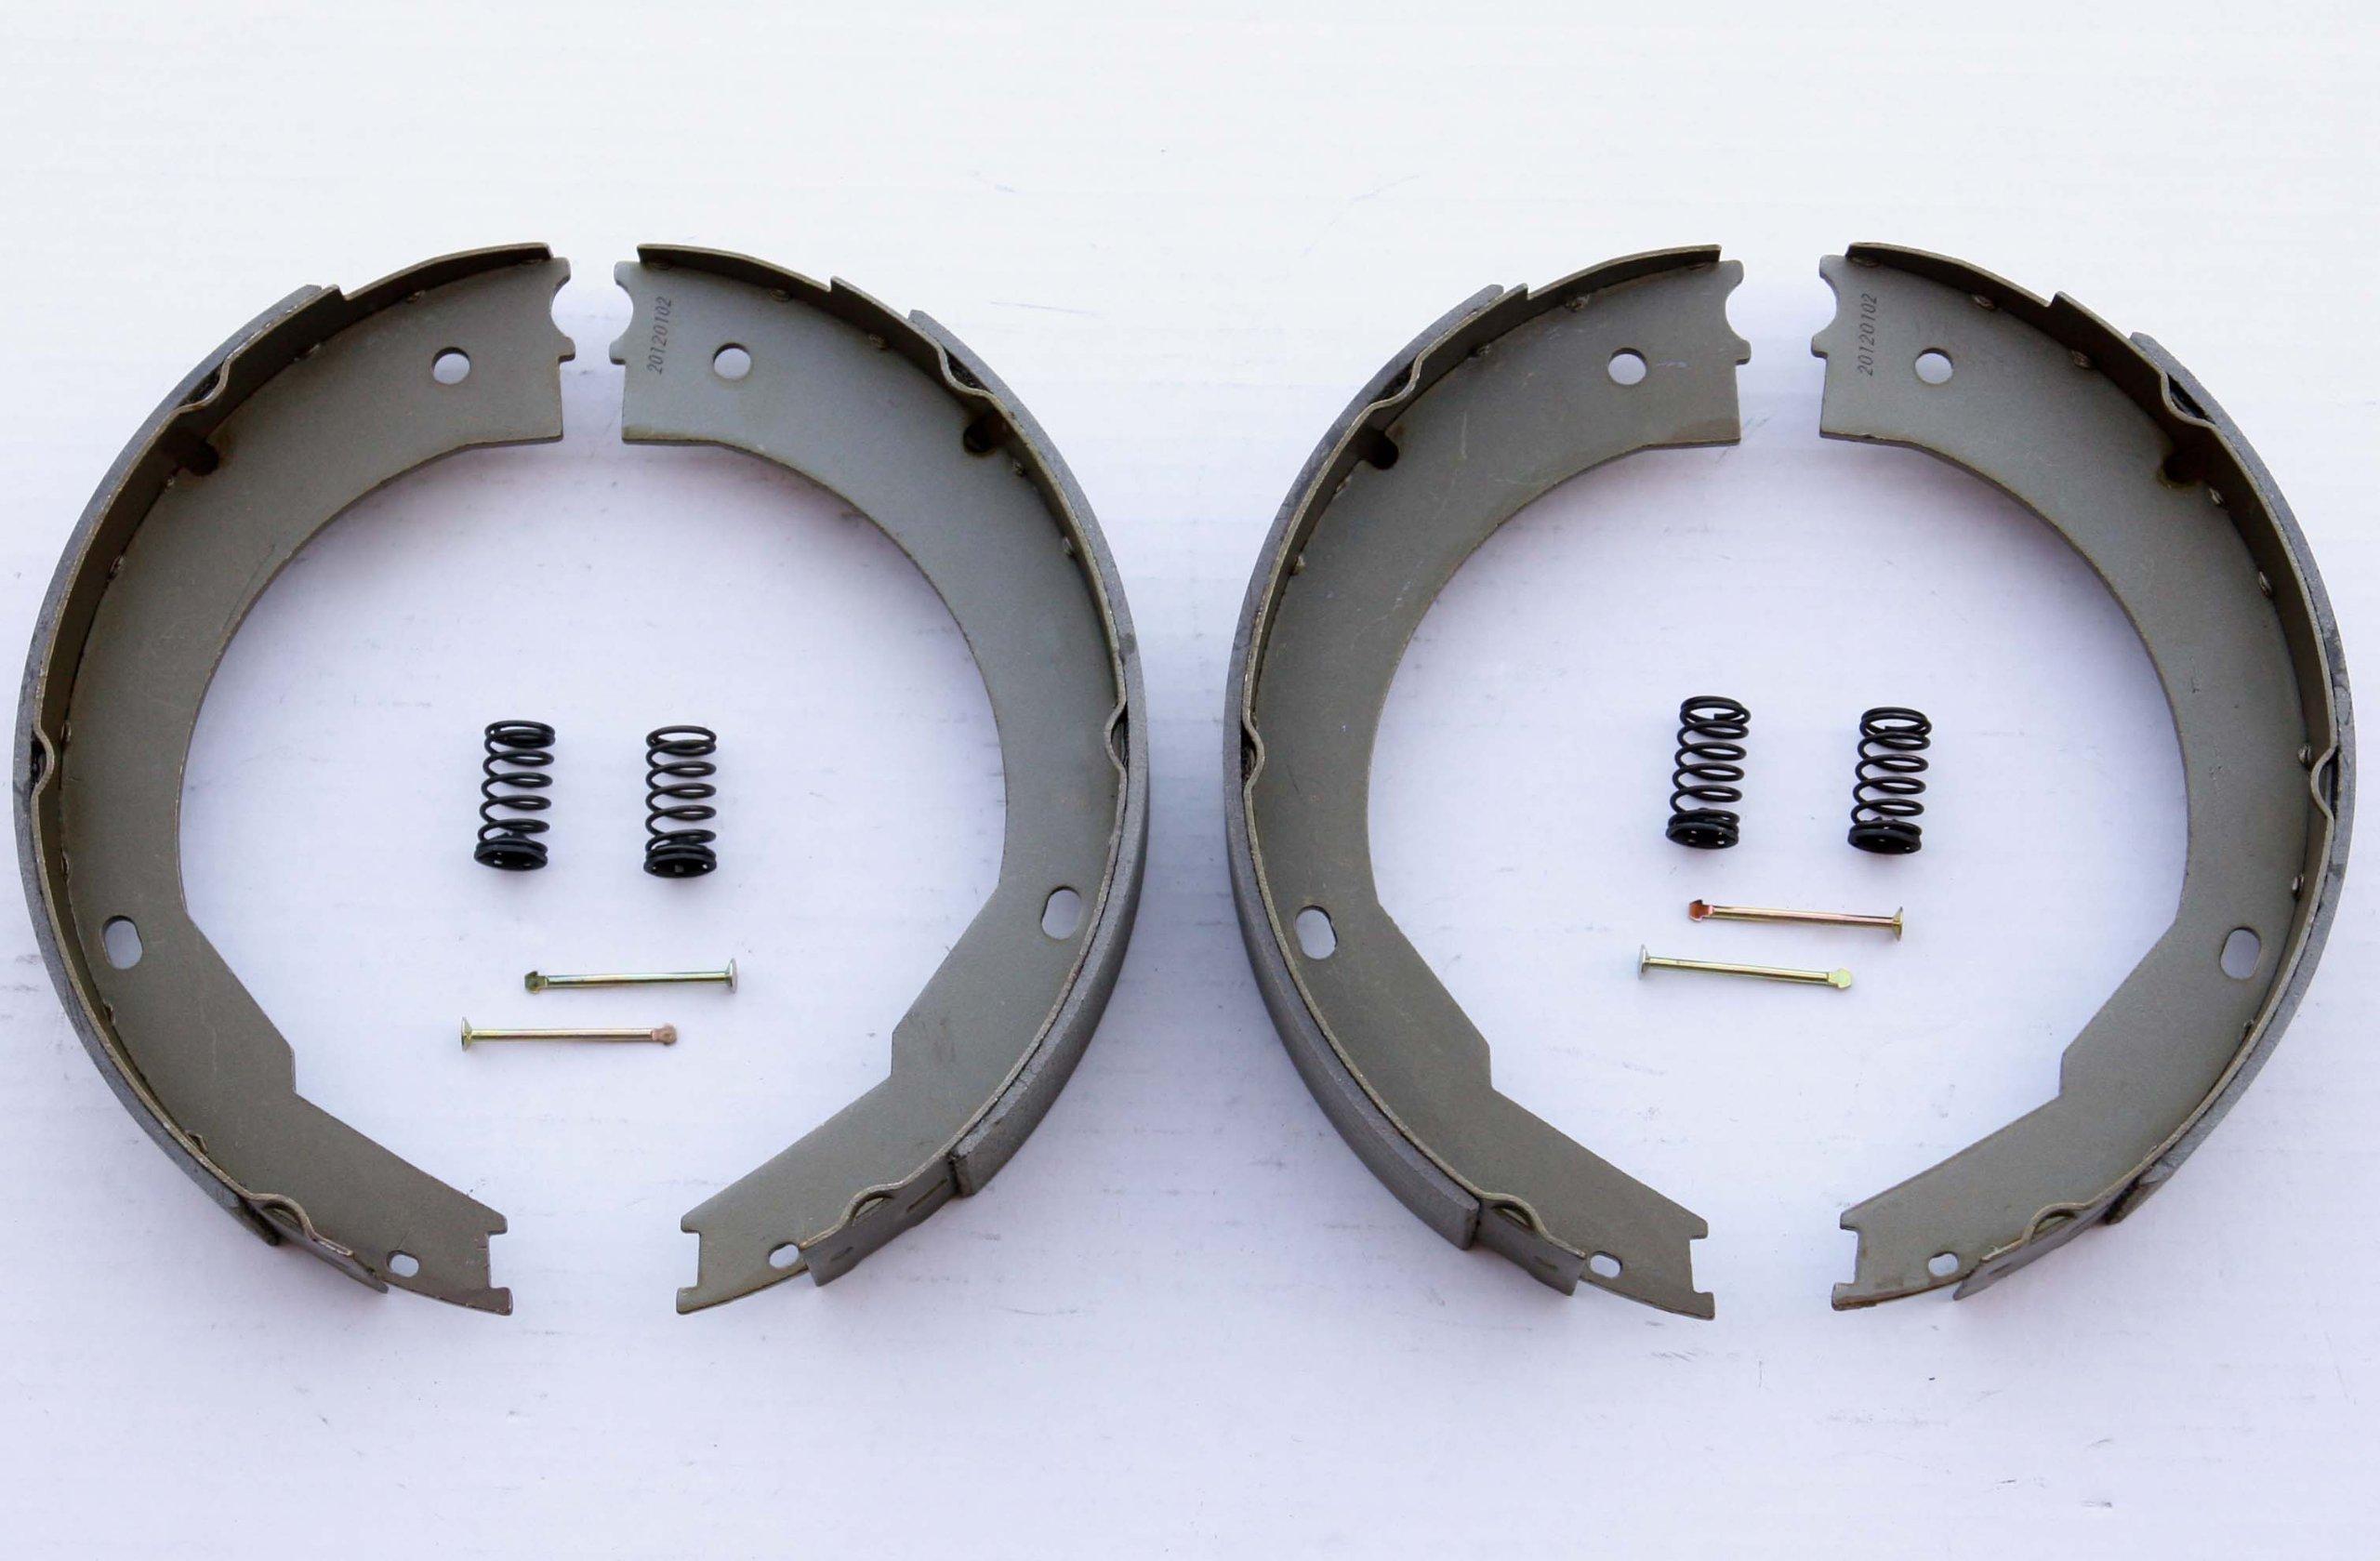 LIBRA 12'' X 2'' trailer brake shoes replacement kits (2 pairs) - 21029/21042 by Libra